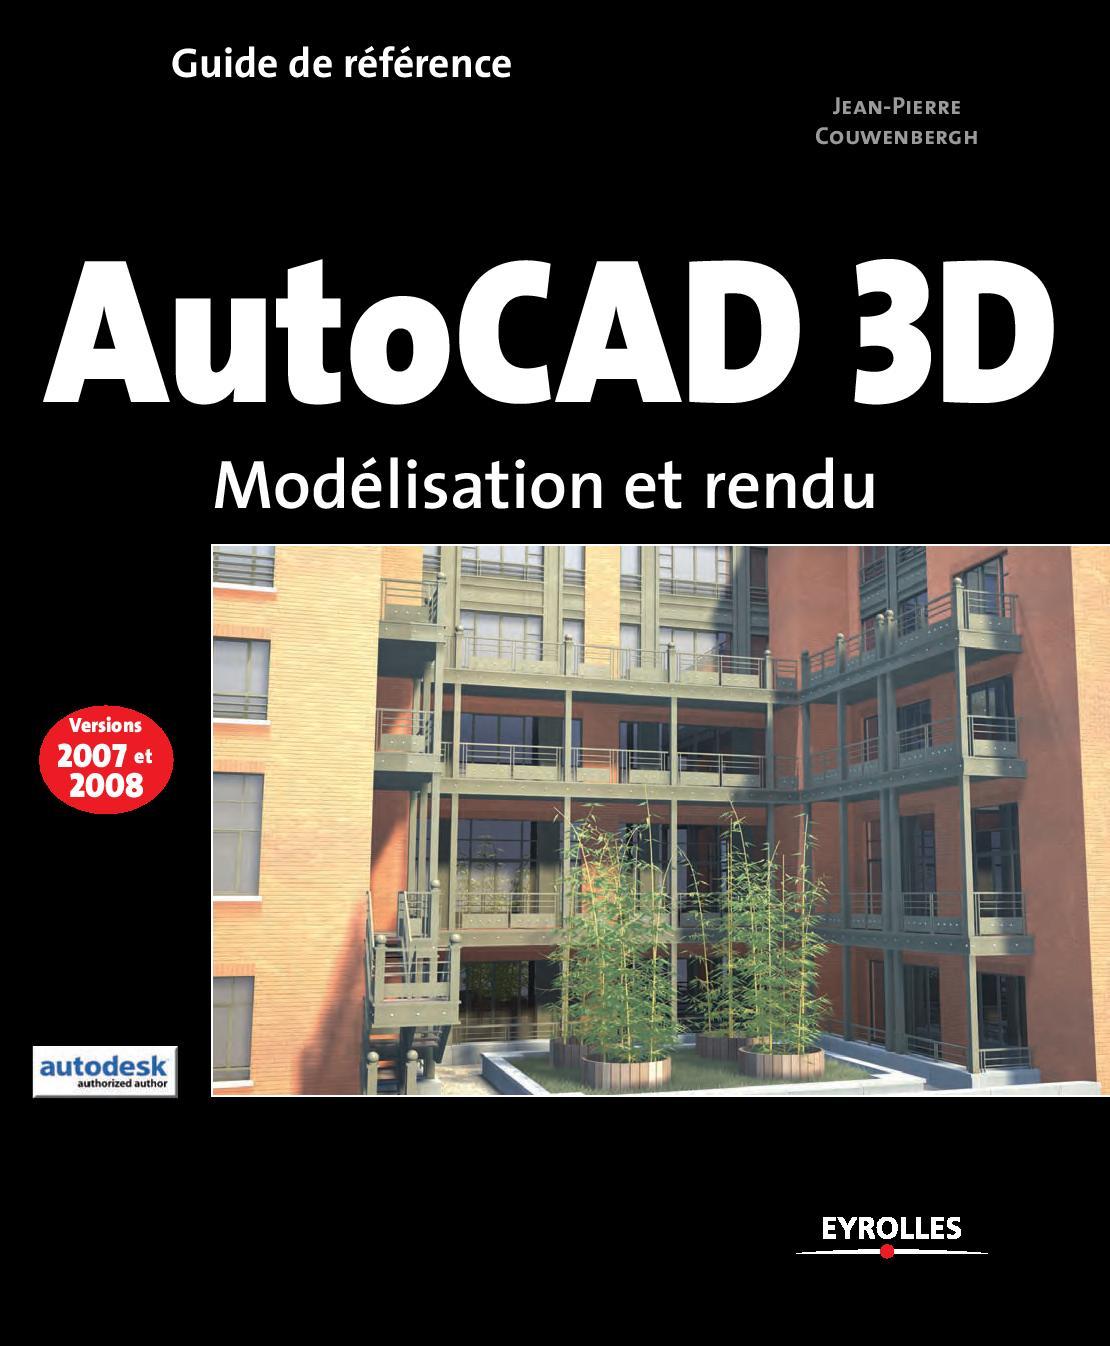 Autocad 3d mod lisation et rendu telecharger magazine for 3d modelisation